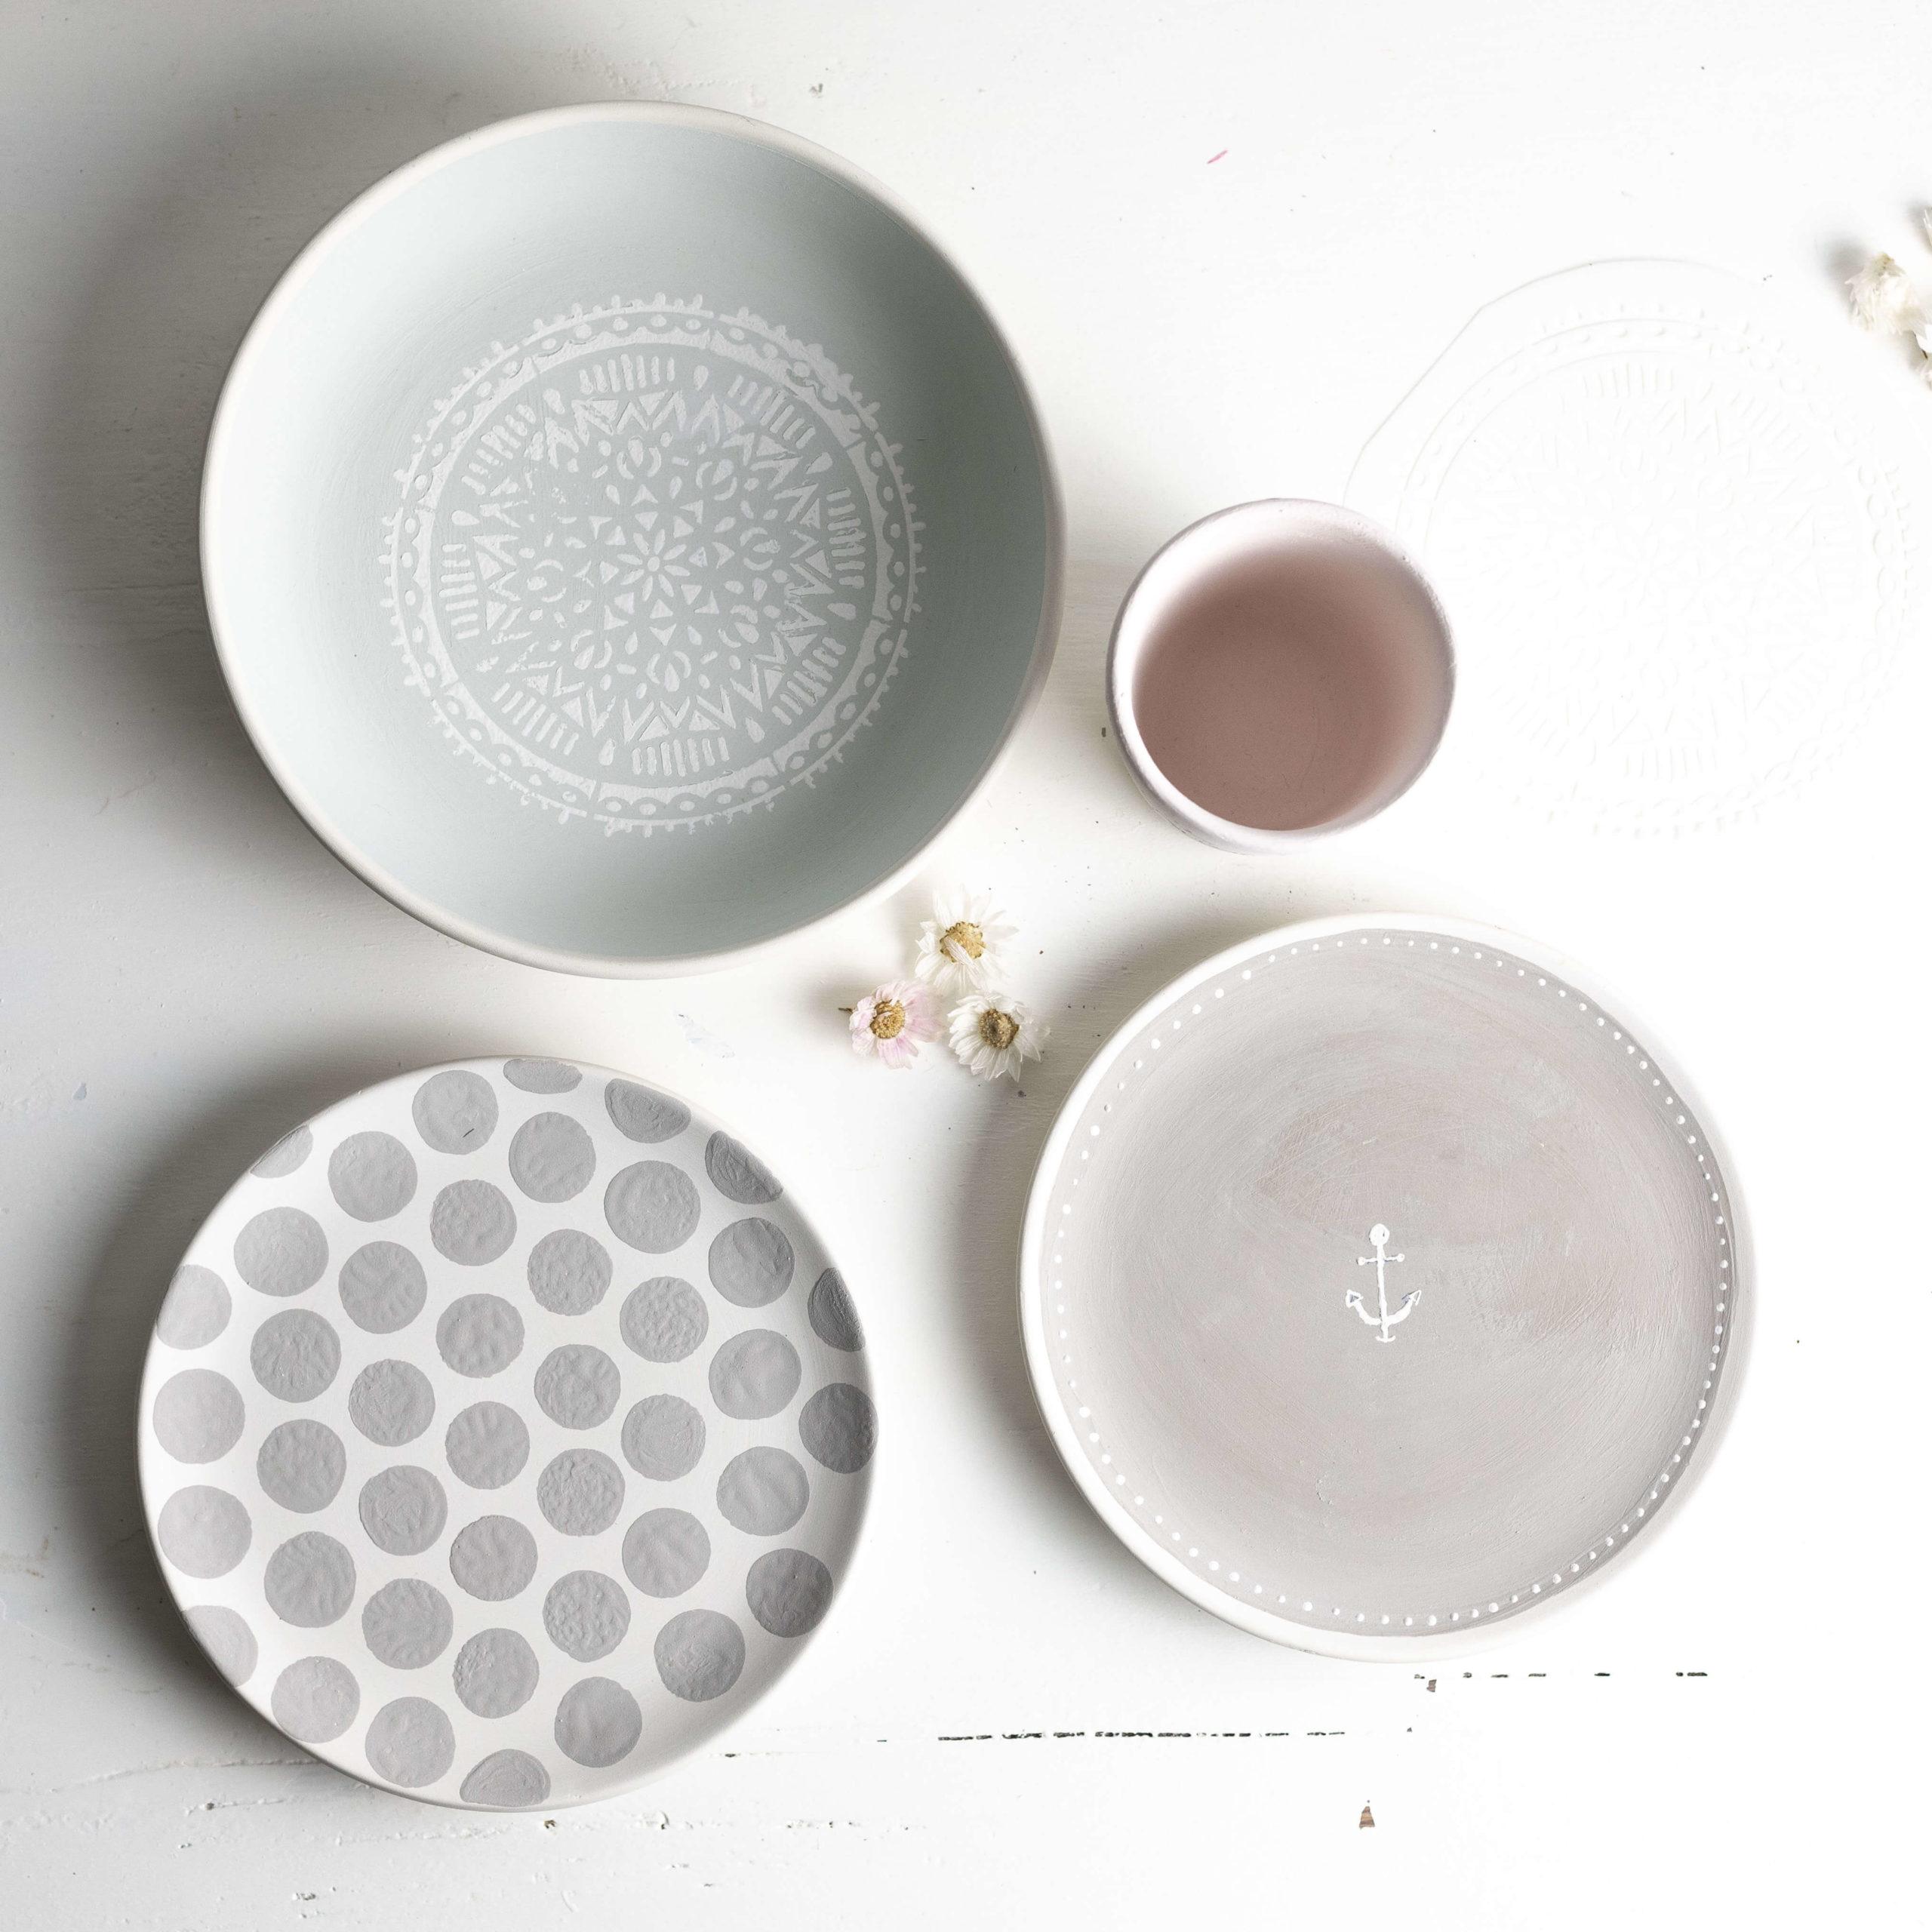 Keramik mit Motiven bemalen